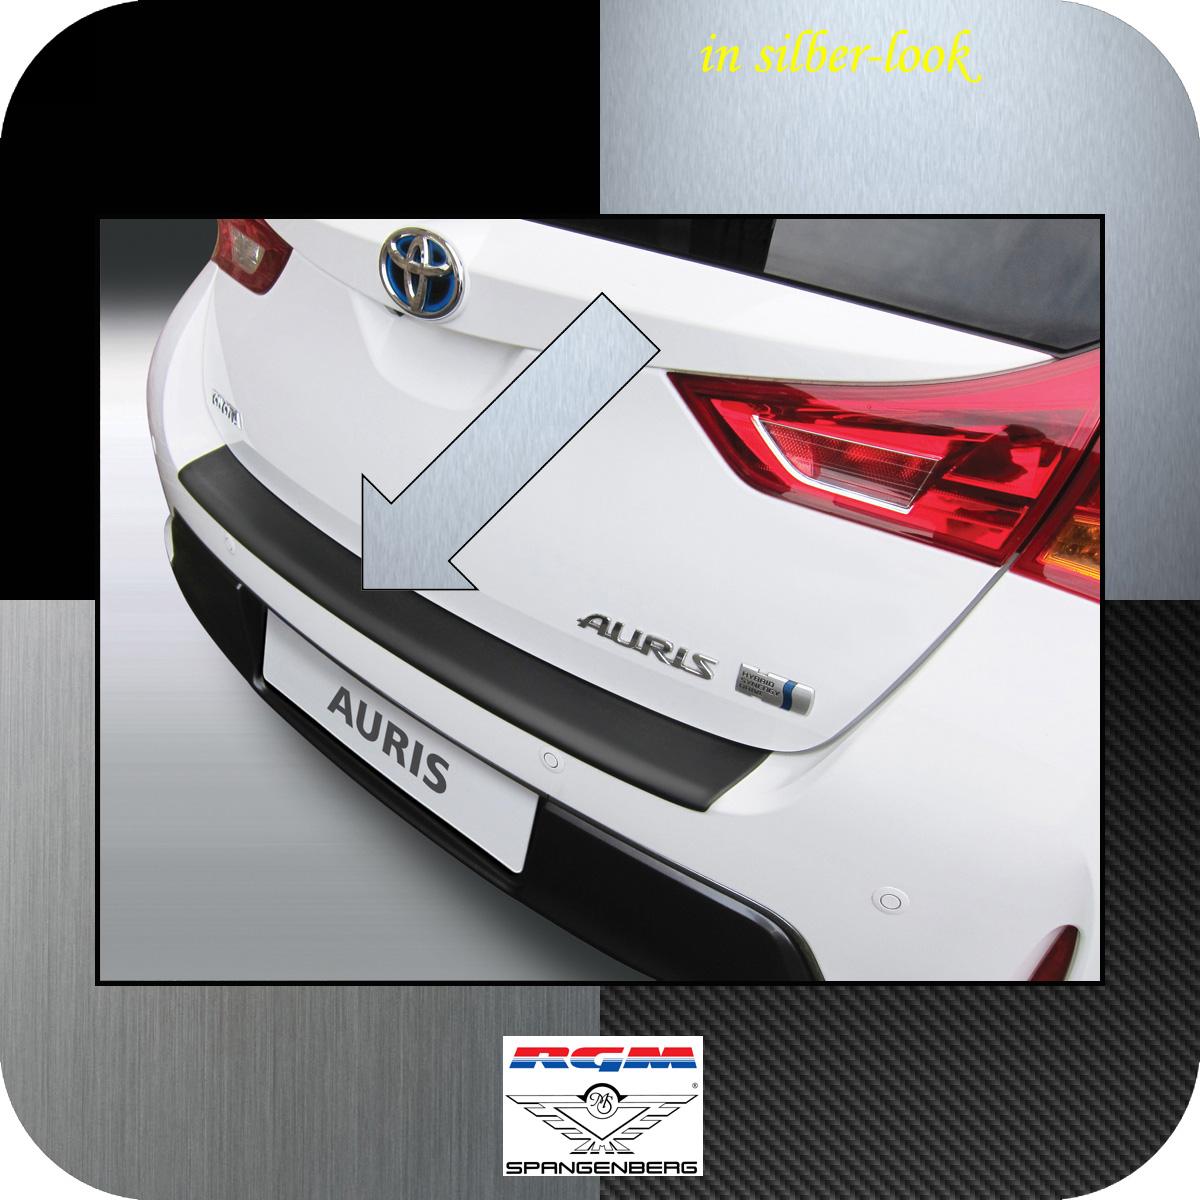 Ladekantenschutz Silber-Look Toyota Auris II Schrägheck vor Mopf 2012-15 3506620